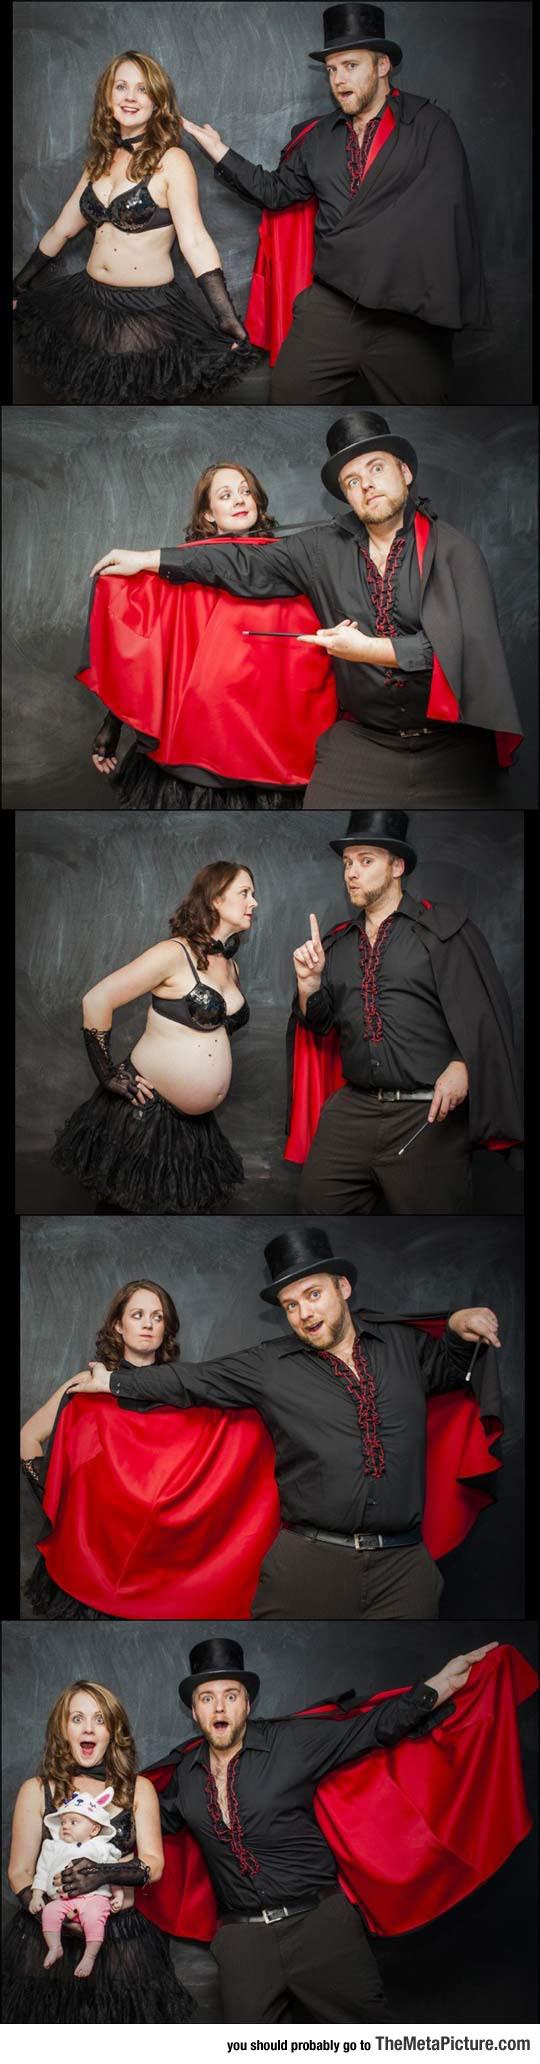 funny-dad-magician-pregnancy-announcement